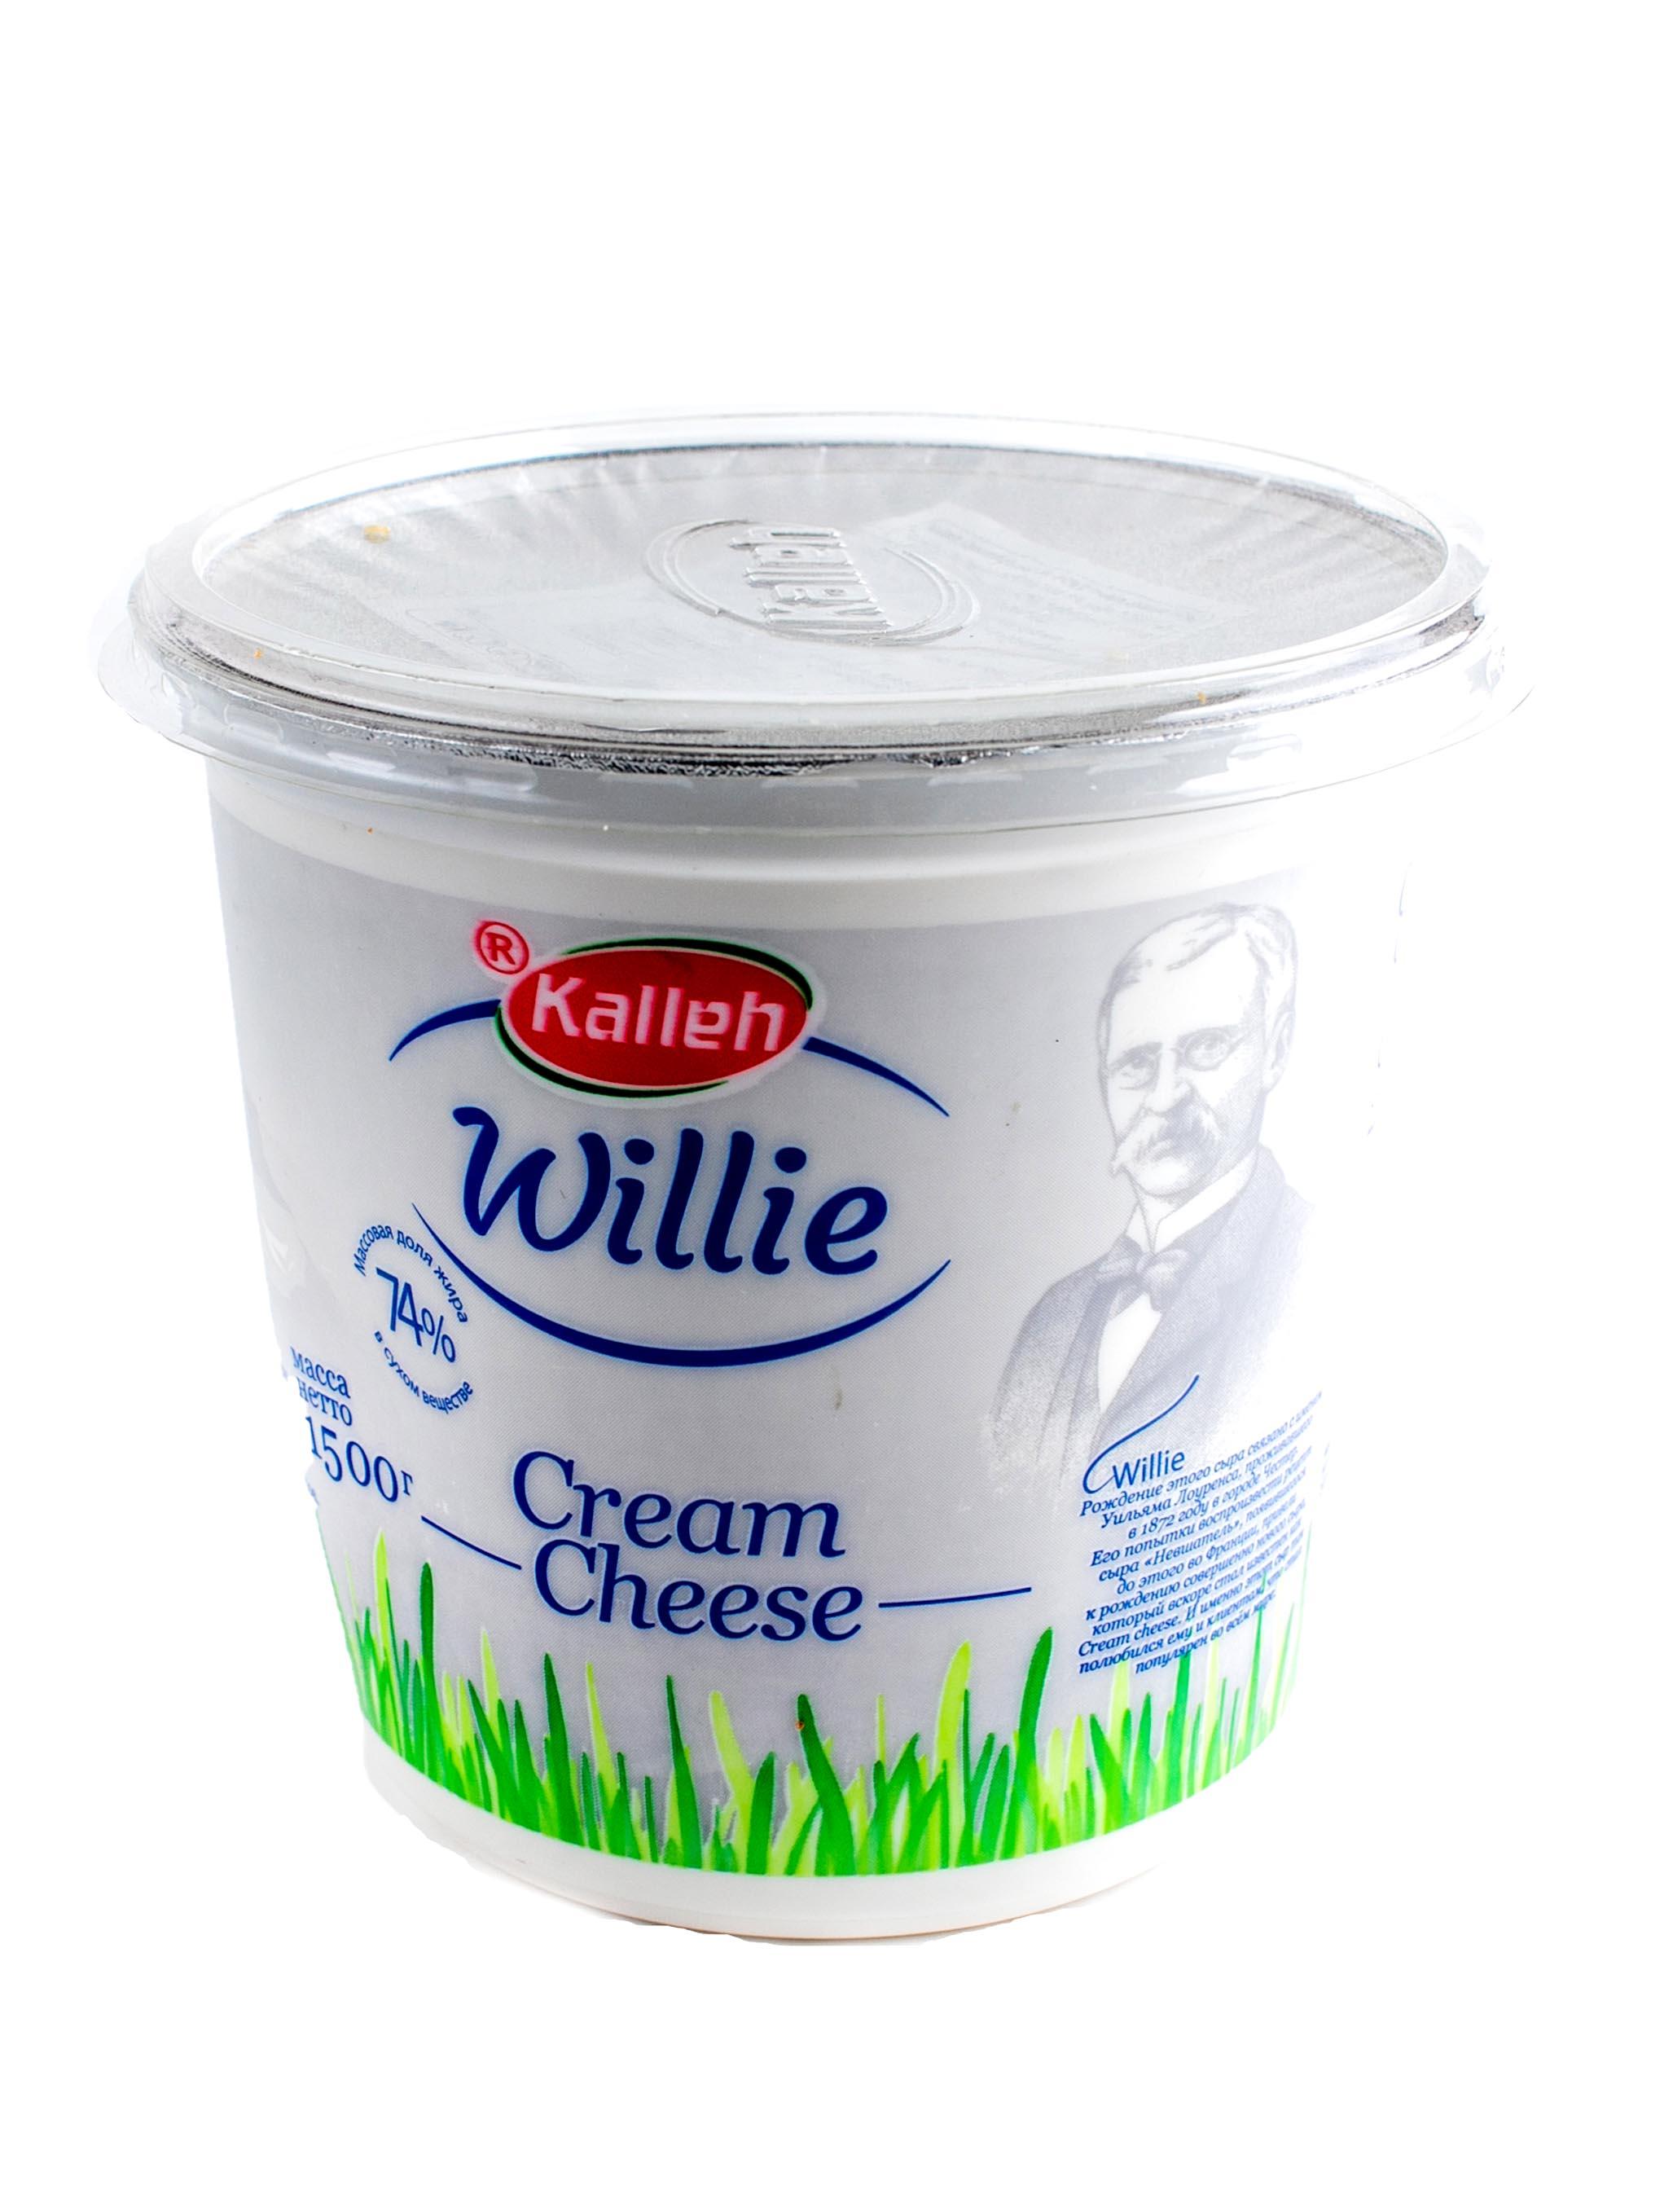 Krem Pendir Willie 74% 1,5 kg